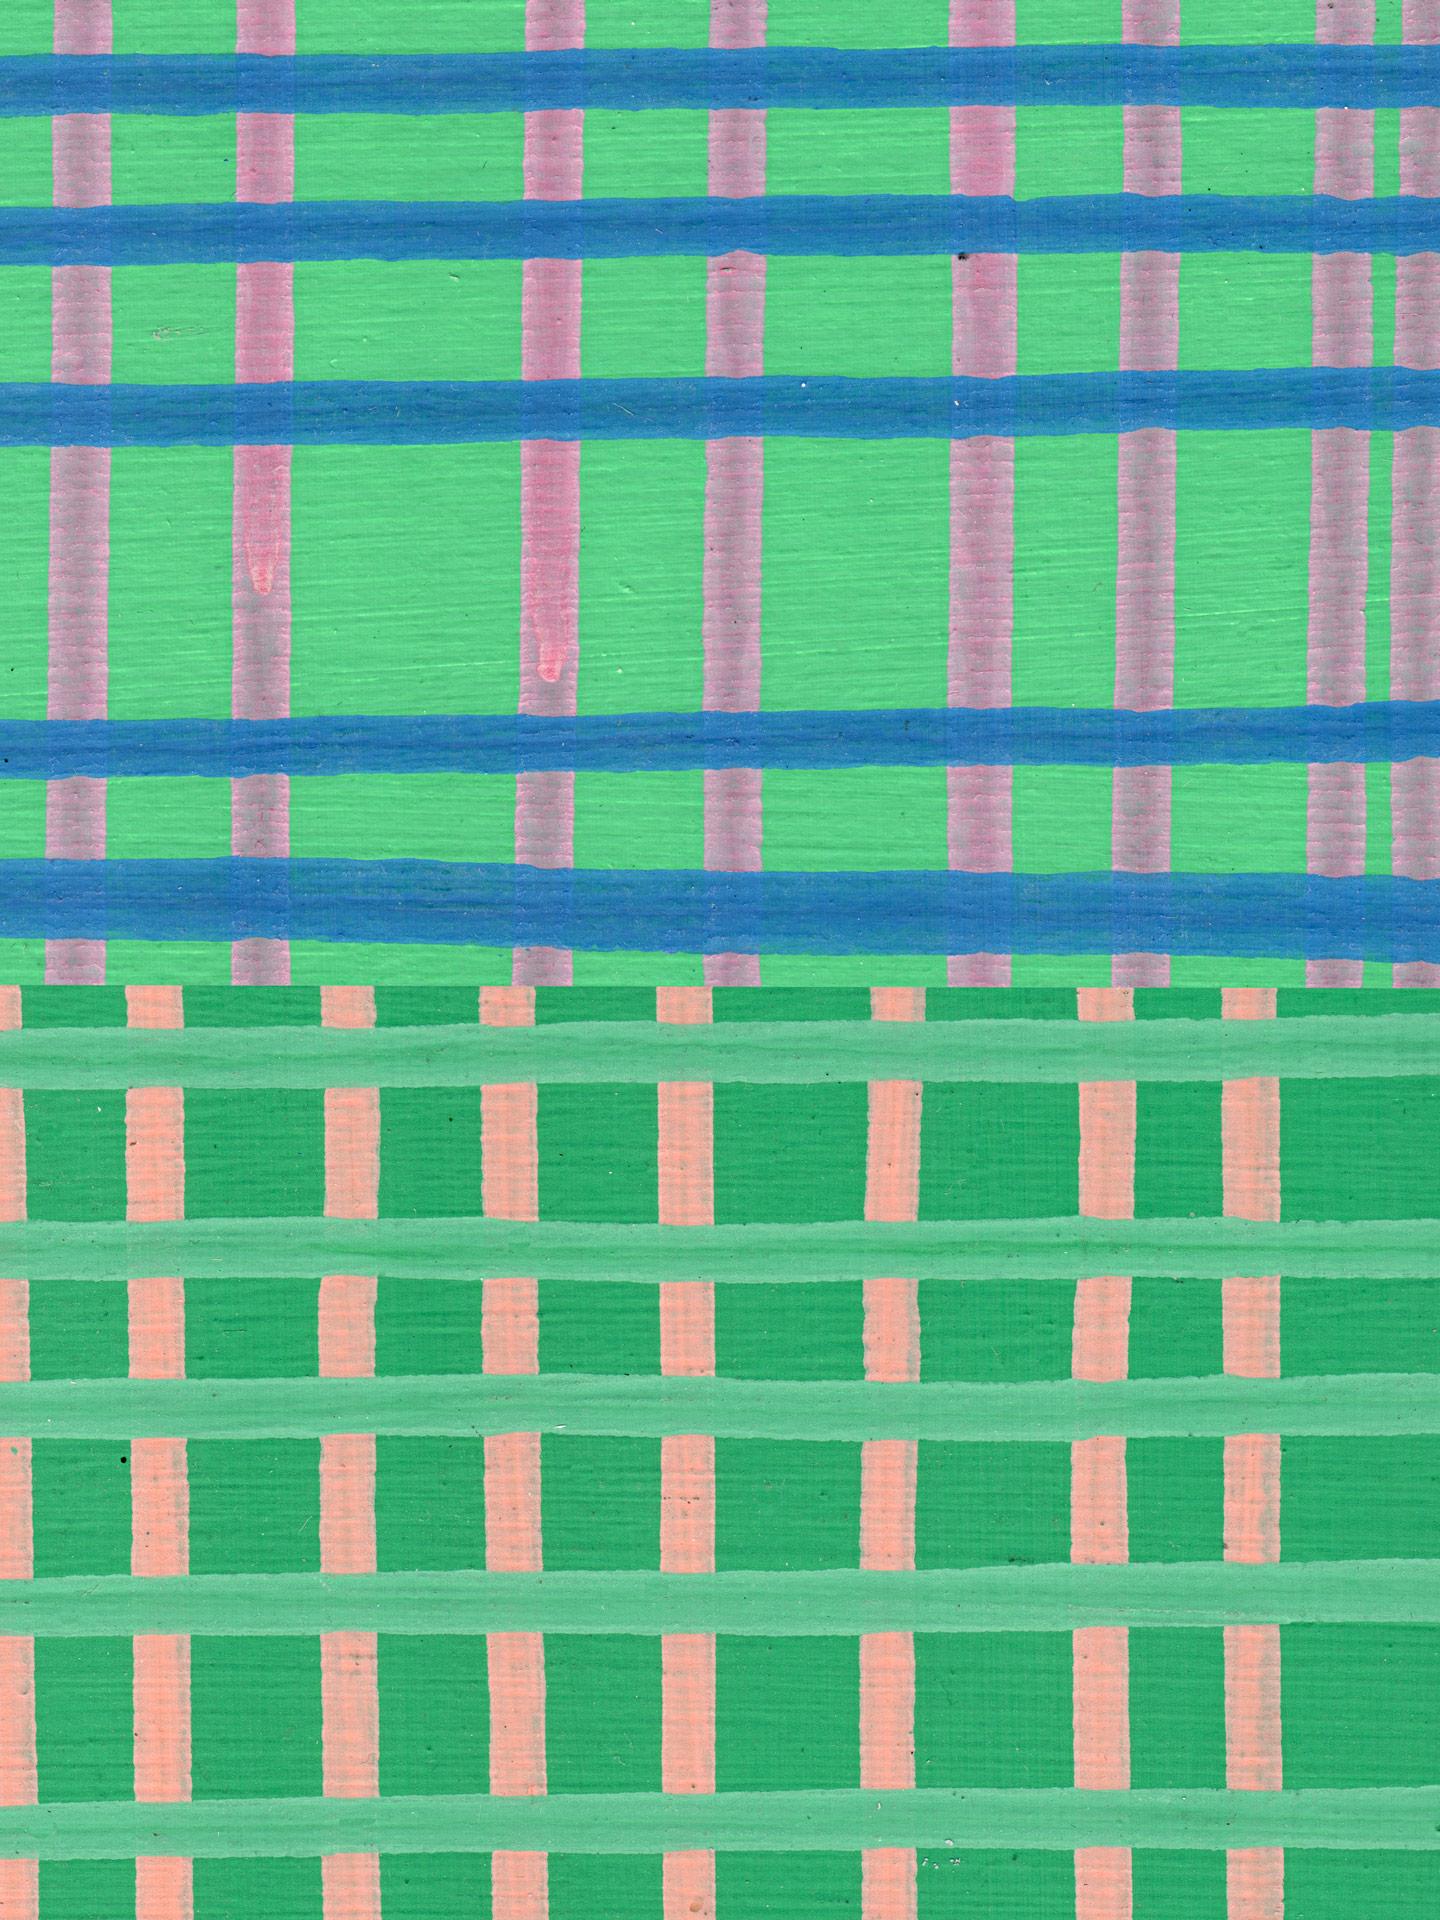 Steve Ingham - Drip Grids - Art Farm Grid '18